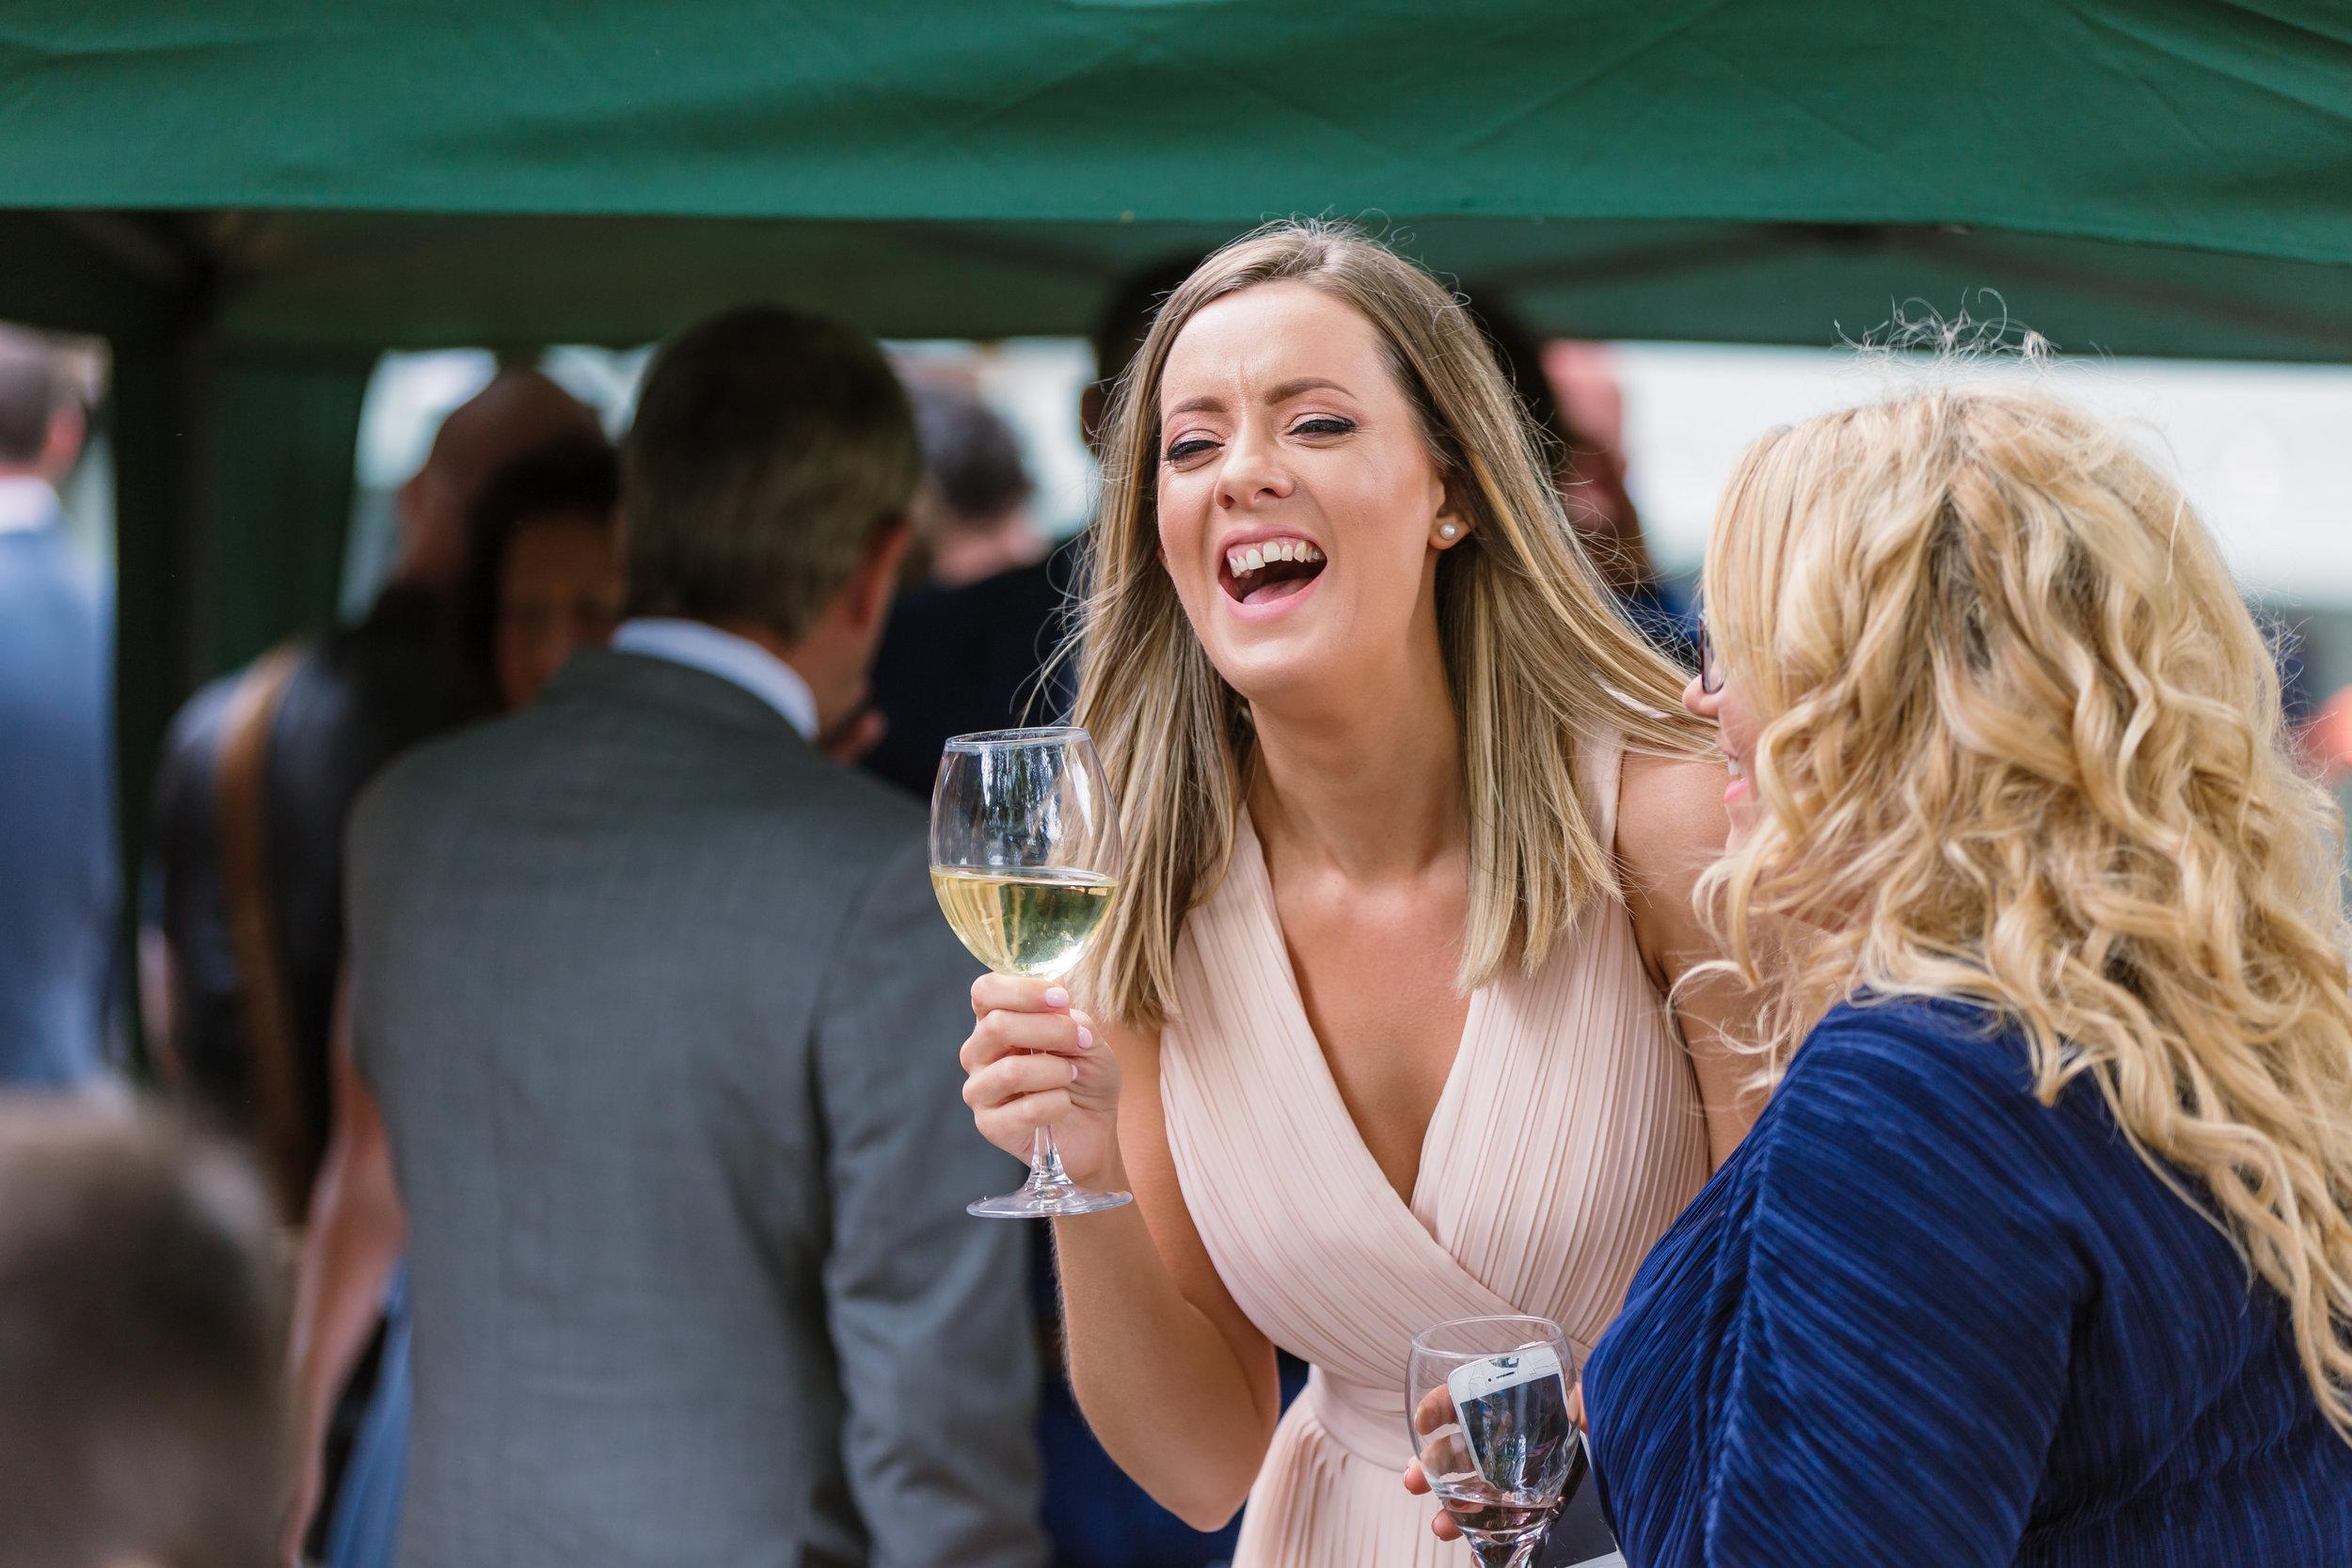 Sarah-Fishlock-Photography : Hampshire-wedding-photographer-hampshire : fleet-wedding-photographer-fleet : Meade-Hall-Wedding-Photographer : Meade-Hall-Wedding-Photos-629.jpg